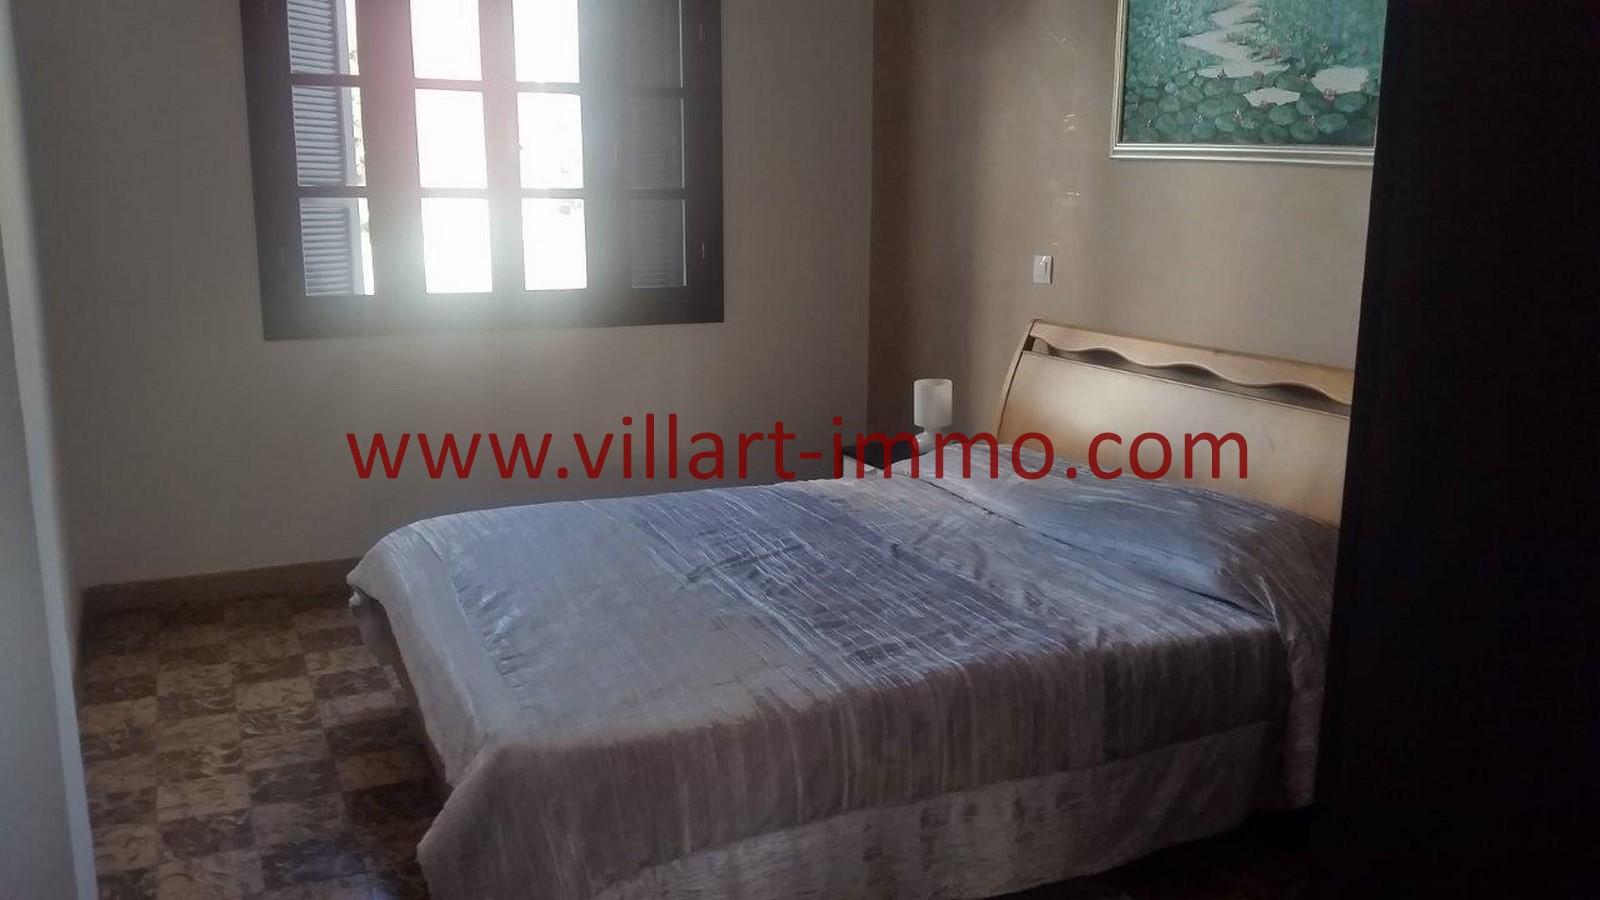 6-location-appartement-meuble-centre-ville-tanger-chambre-1-l965-villart-immo